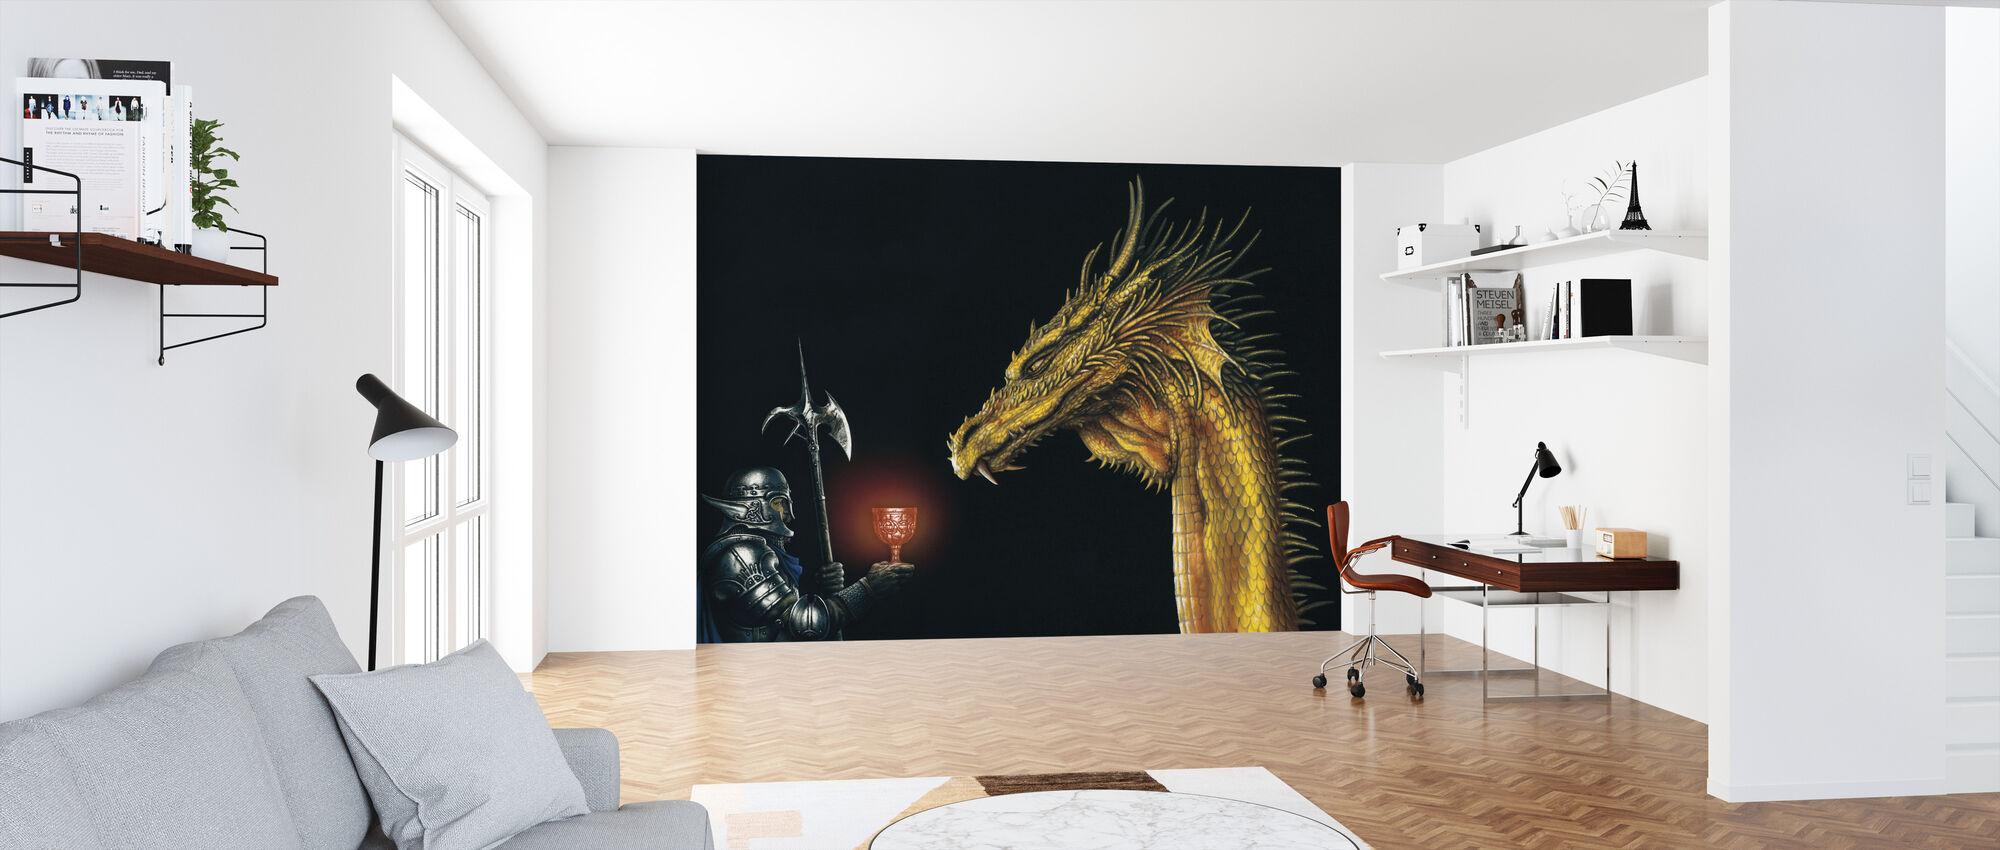 Oro - Wallpaper - Office